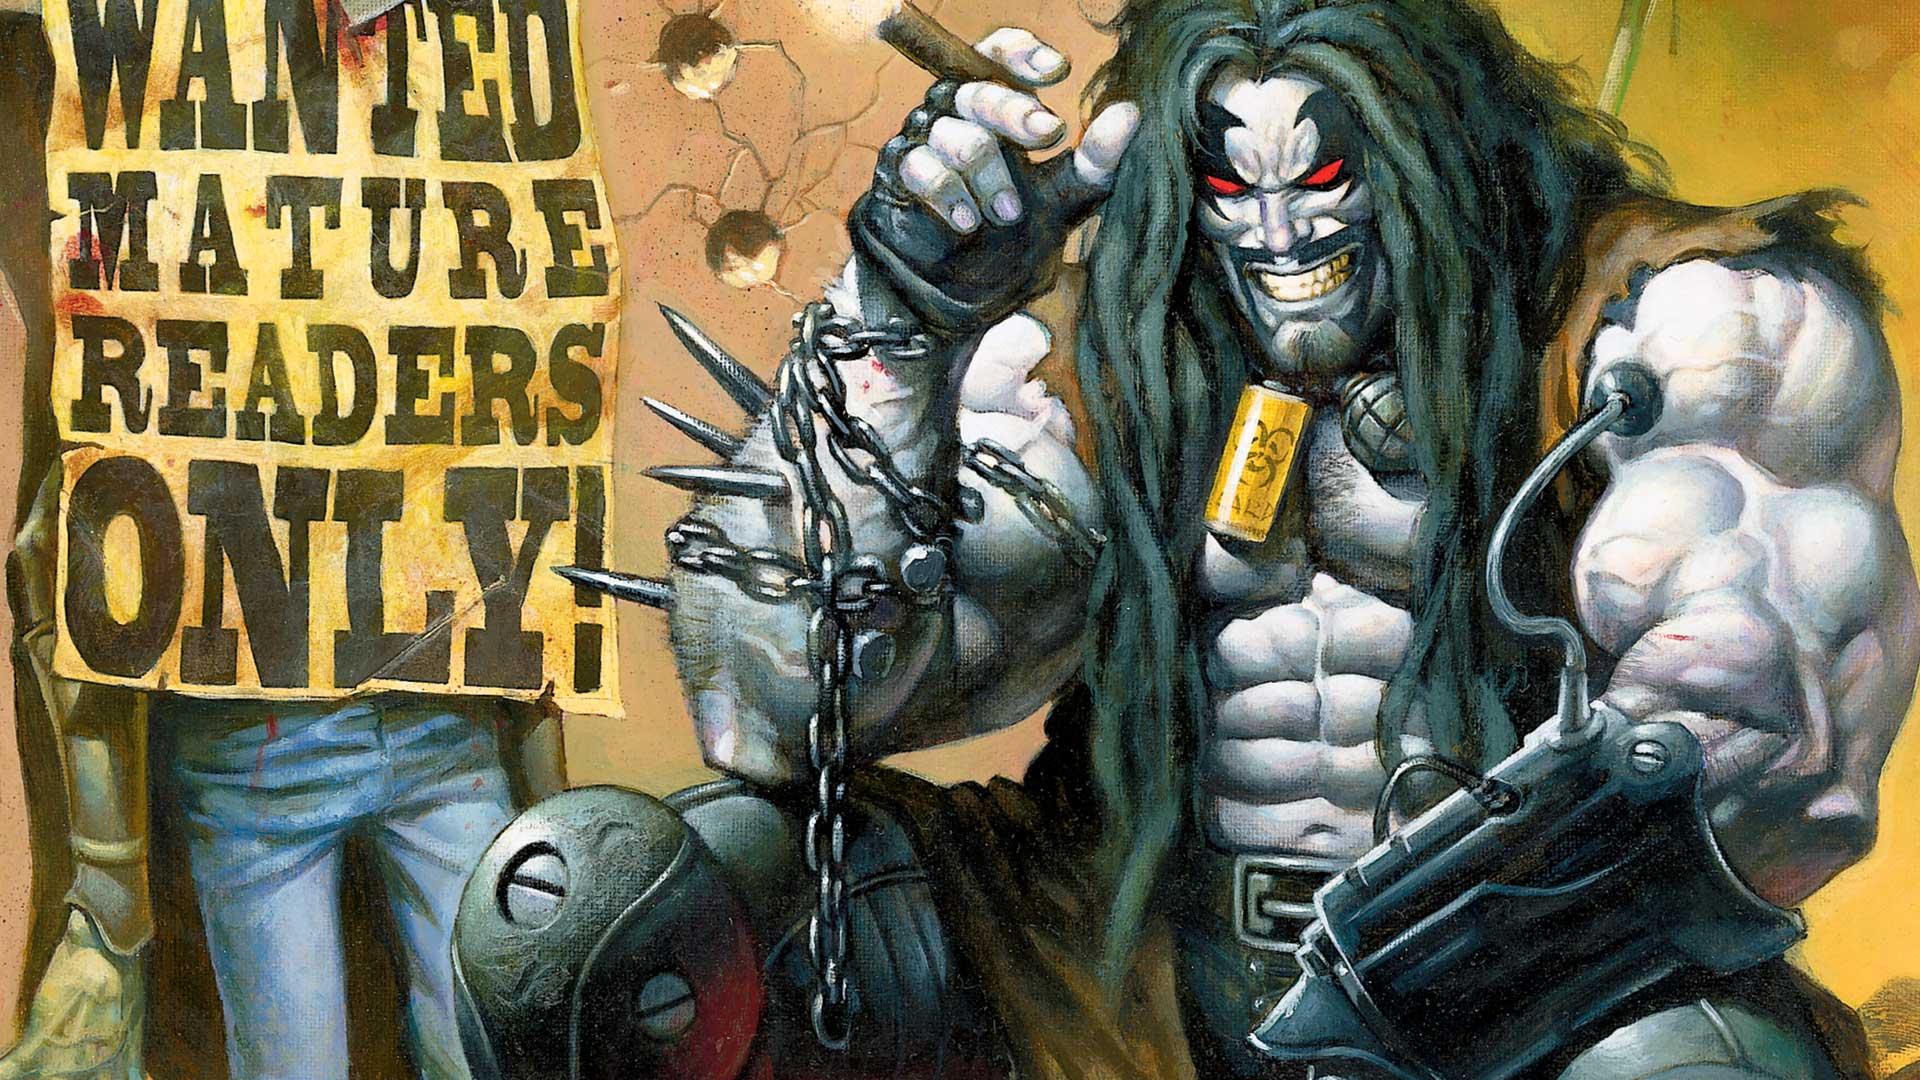 Lobo Movie - DC Comics / Warner Bros.